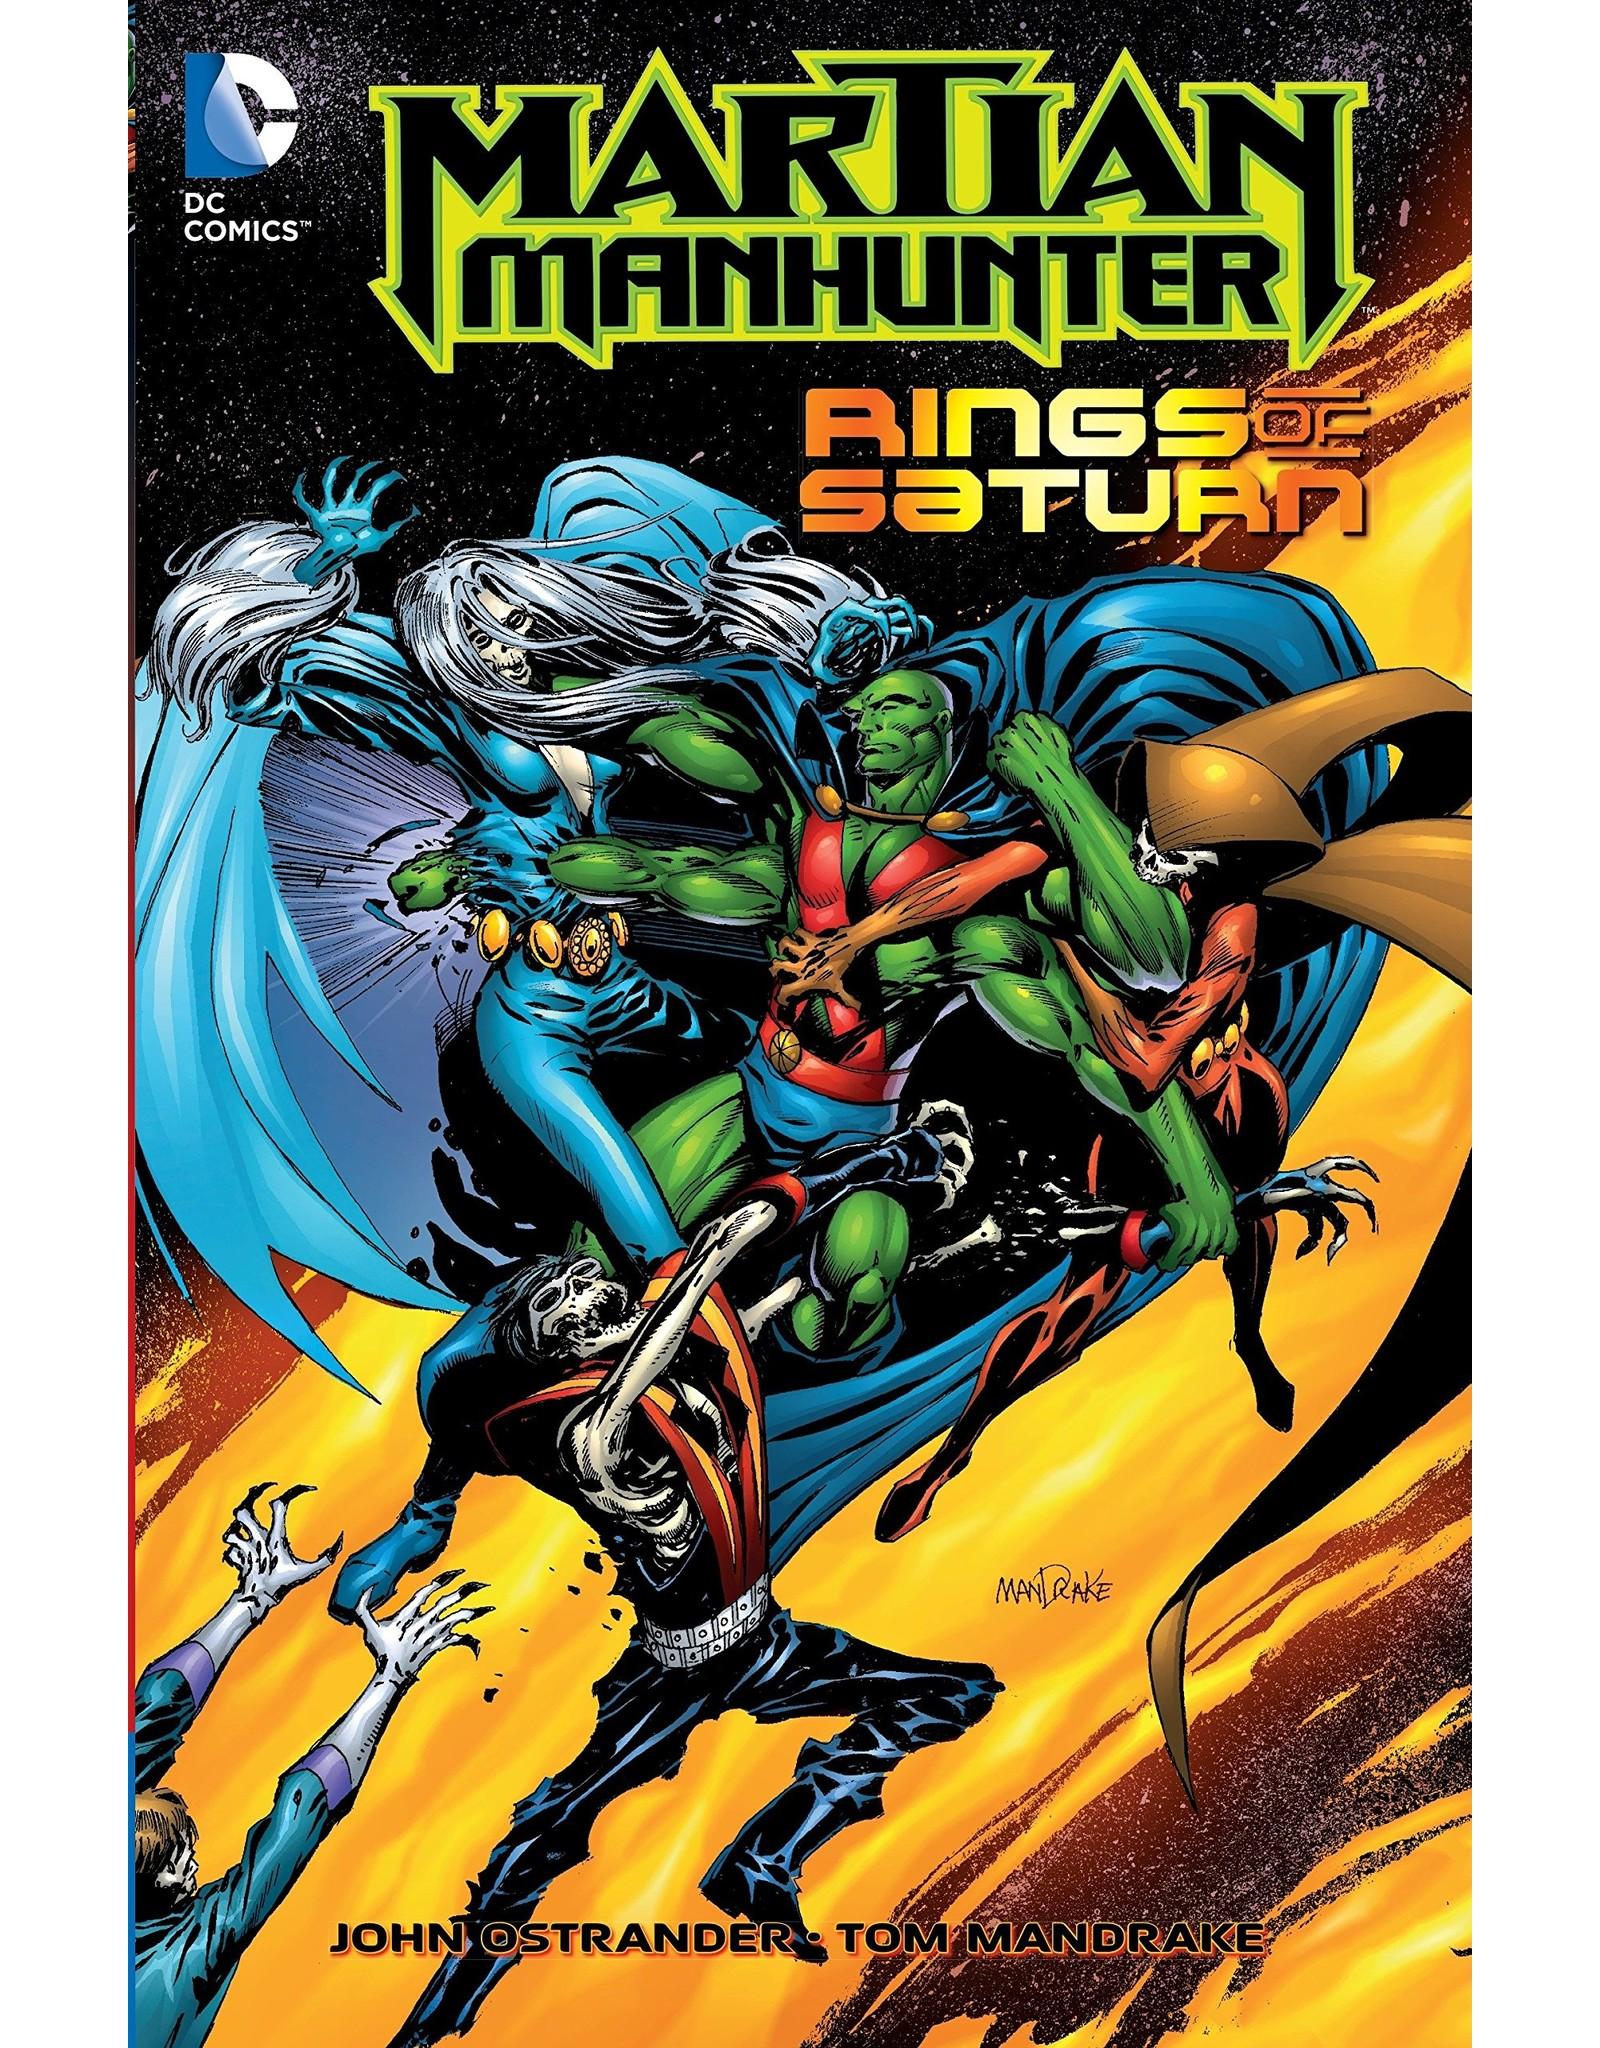 DC COMICS MARTIAN MANHUNTER RINGS OF SATURN TP